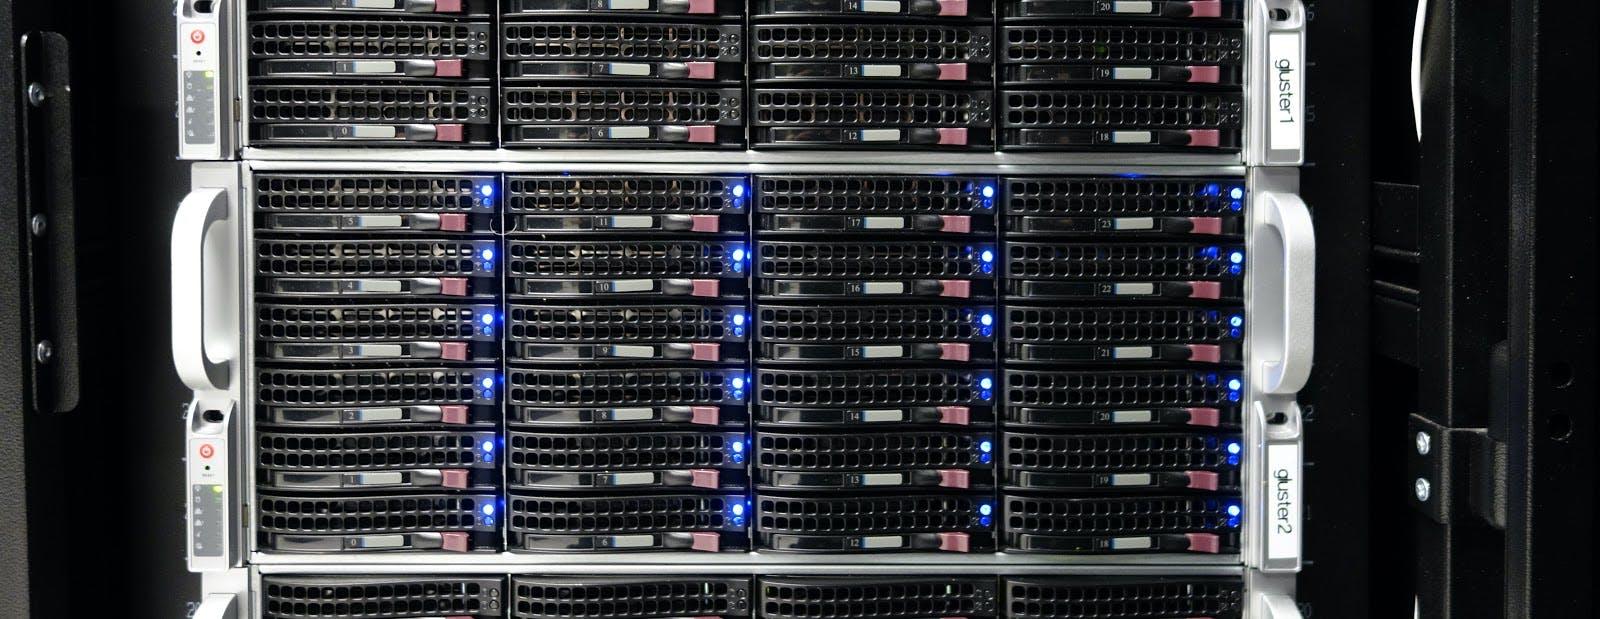 FTP server.